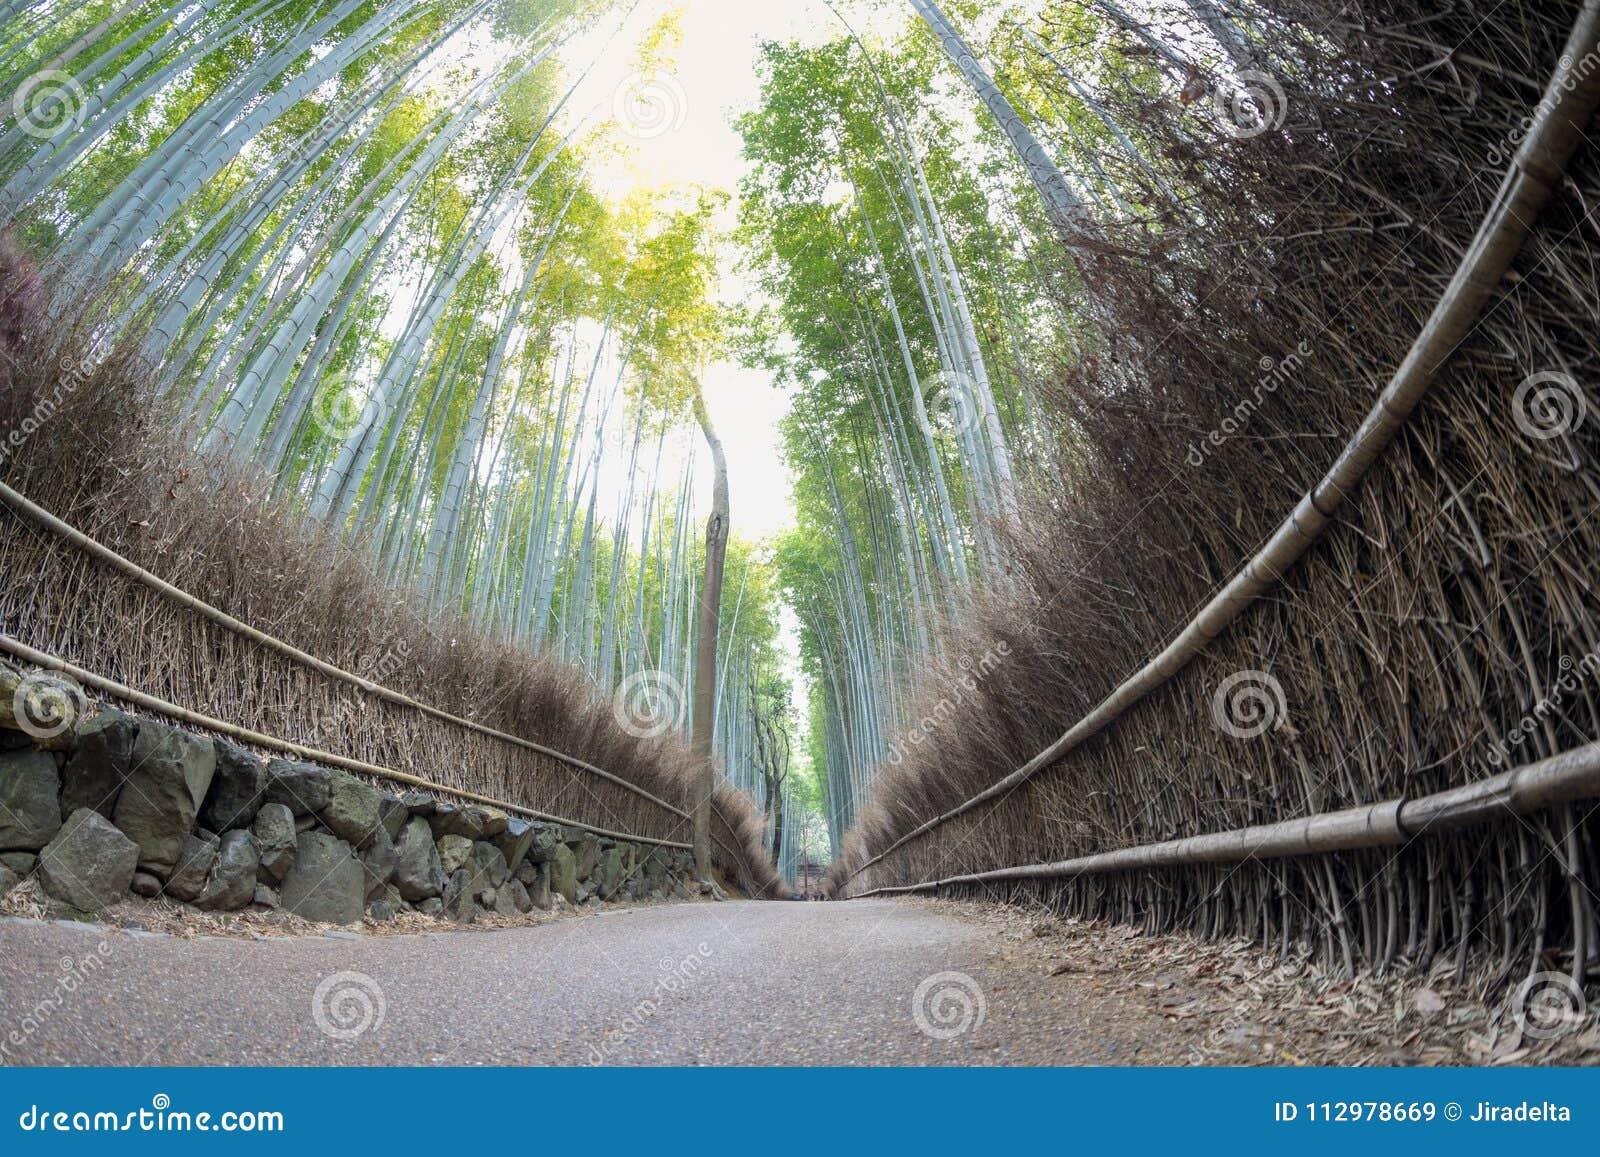 Bamboo path of Arashiyama view from Low angle